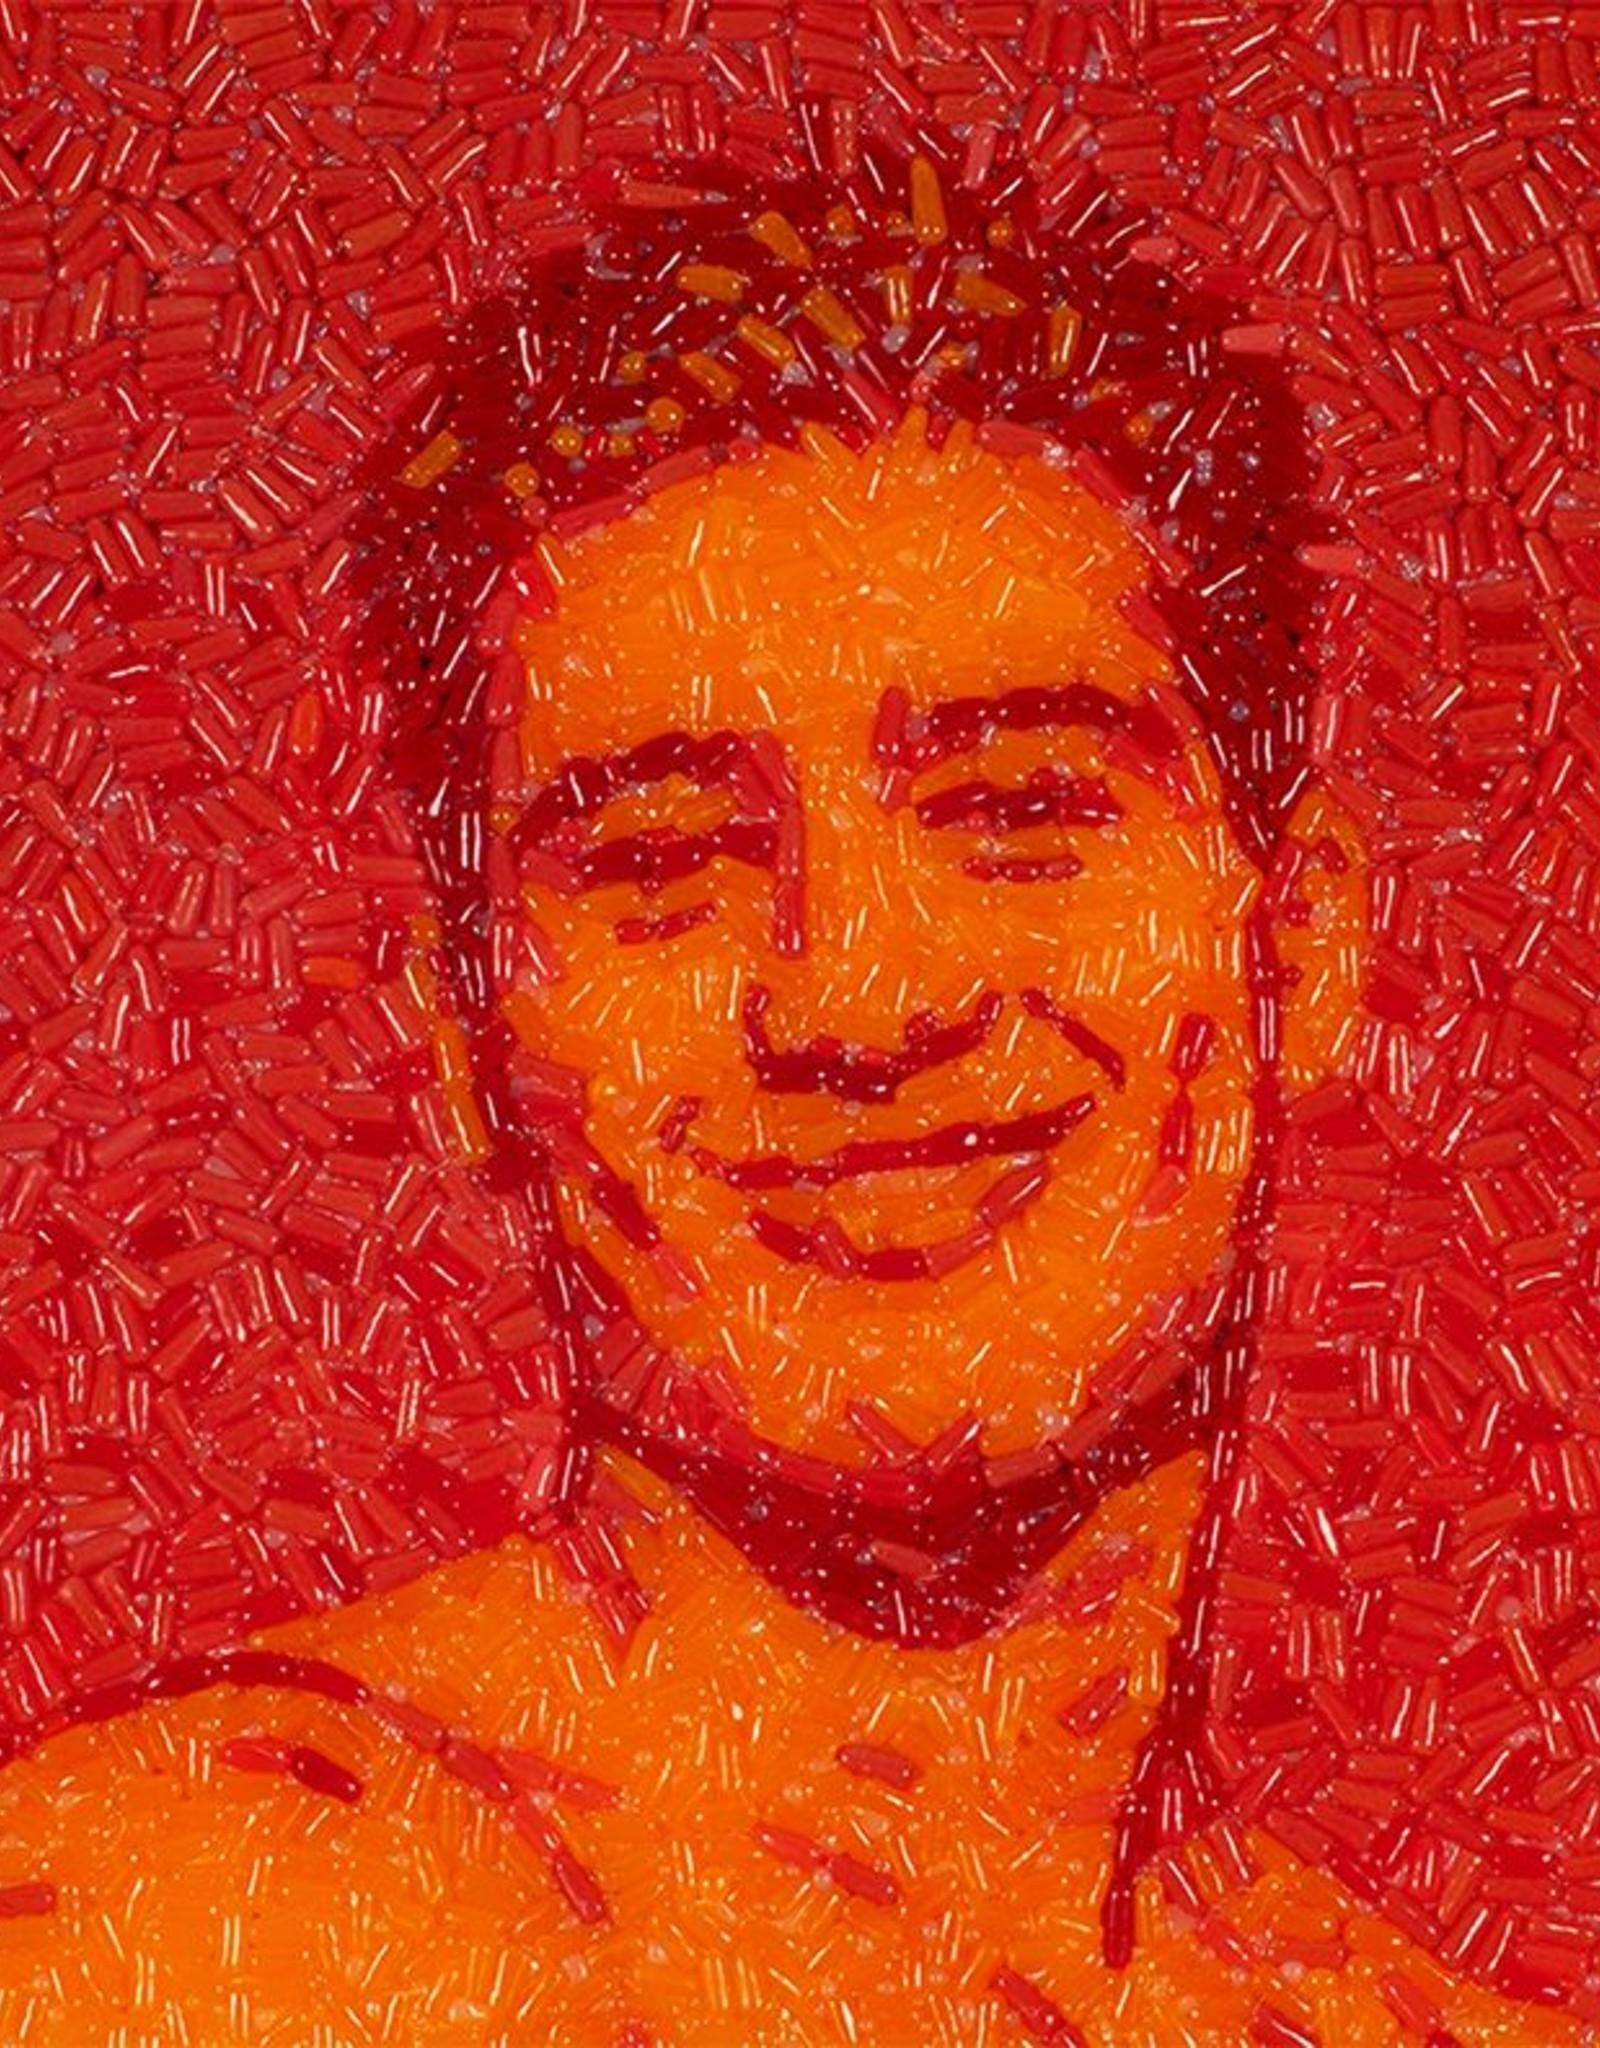 Candylebrity Artwork (24x24) - Mario Lopez/Hot Tamales